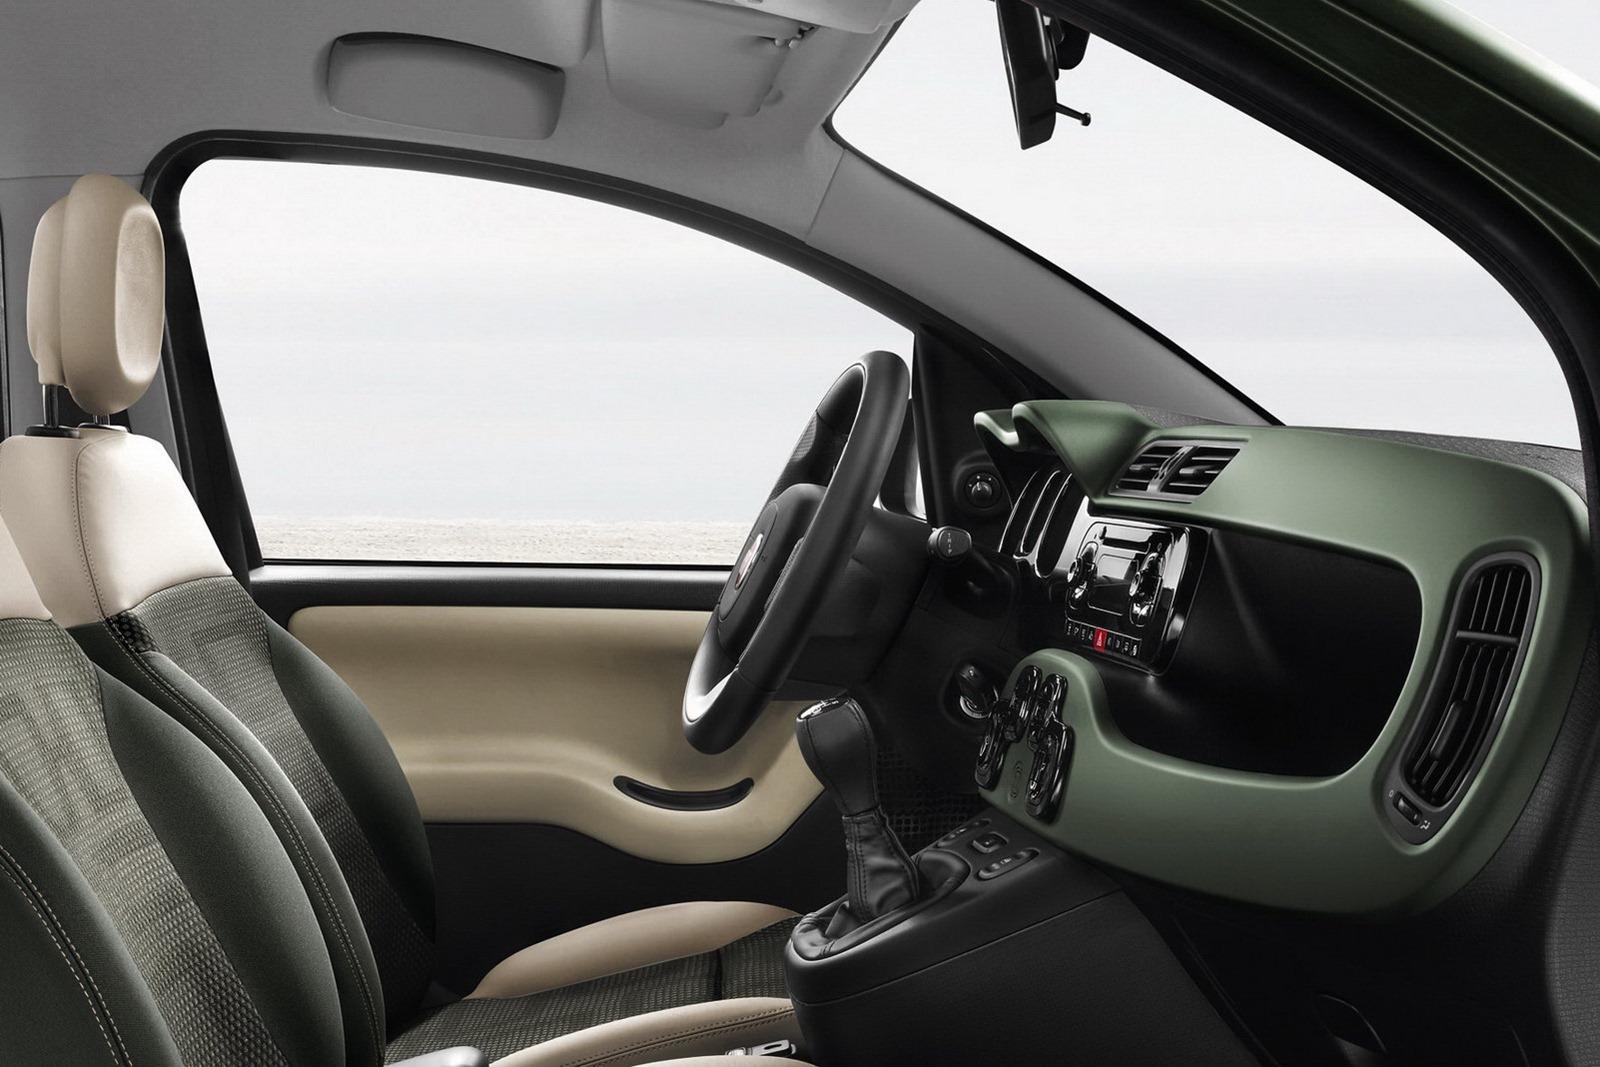 Topworldauto Photos Of Fiat Panda 4x4 Photo Galleries